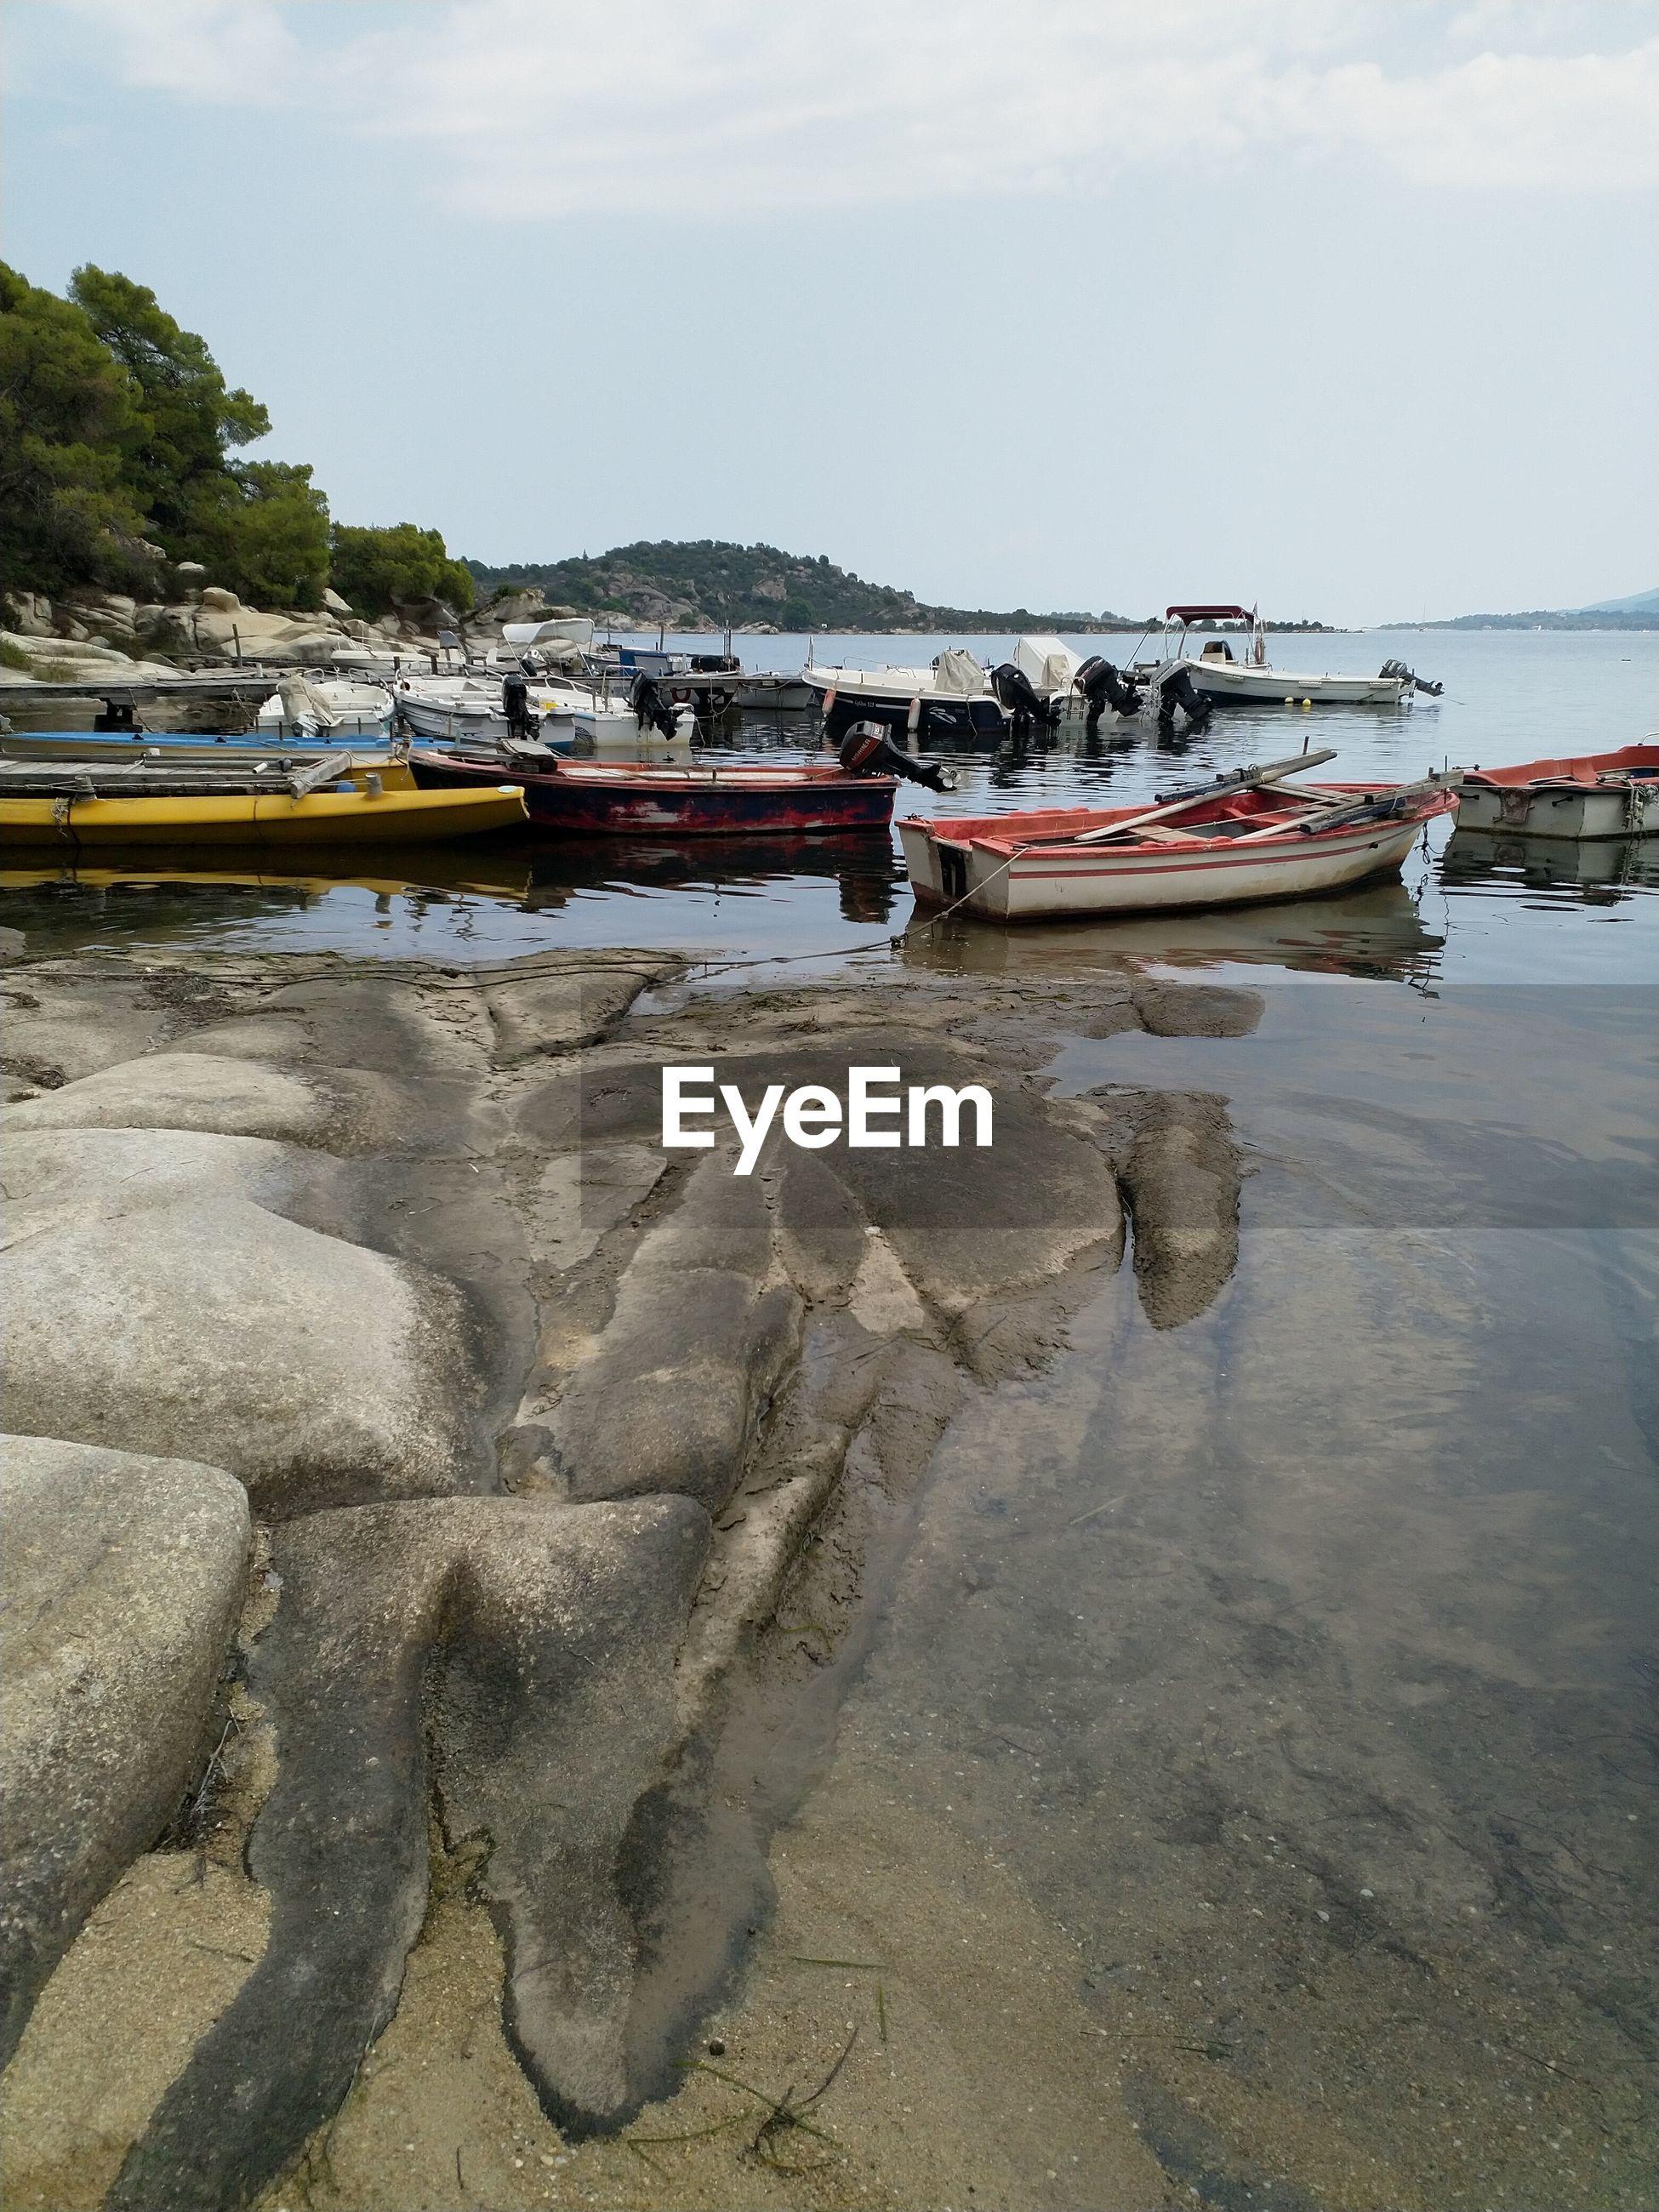 BOATS MOORED ON SEA SHORE AGAINST SKY